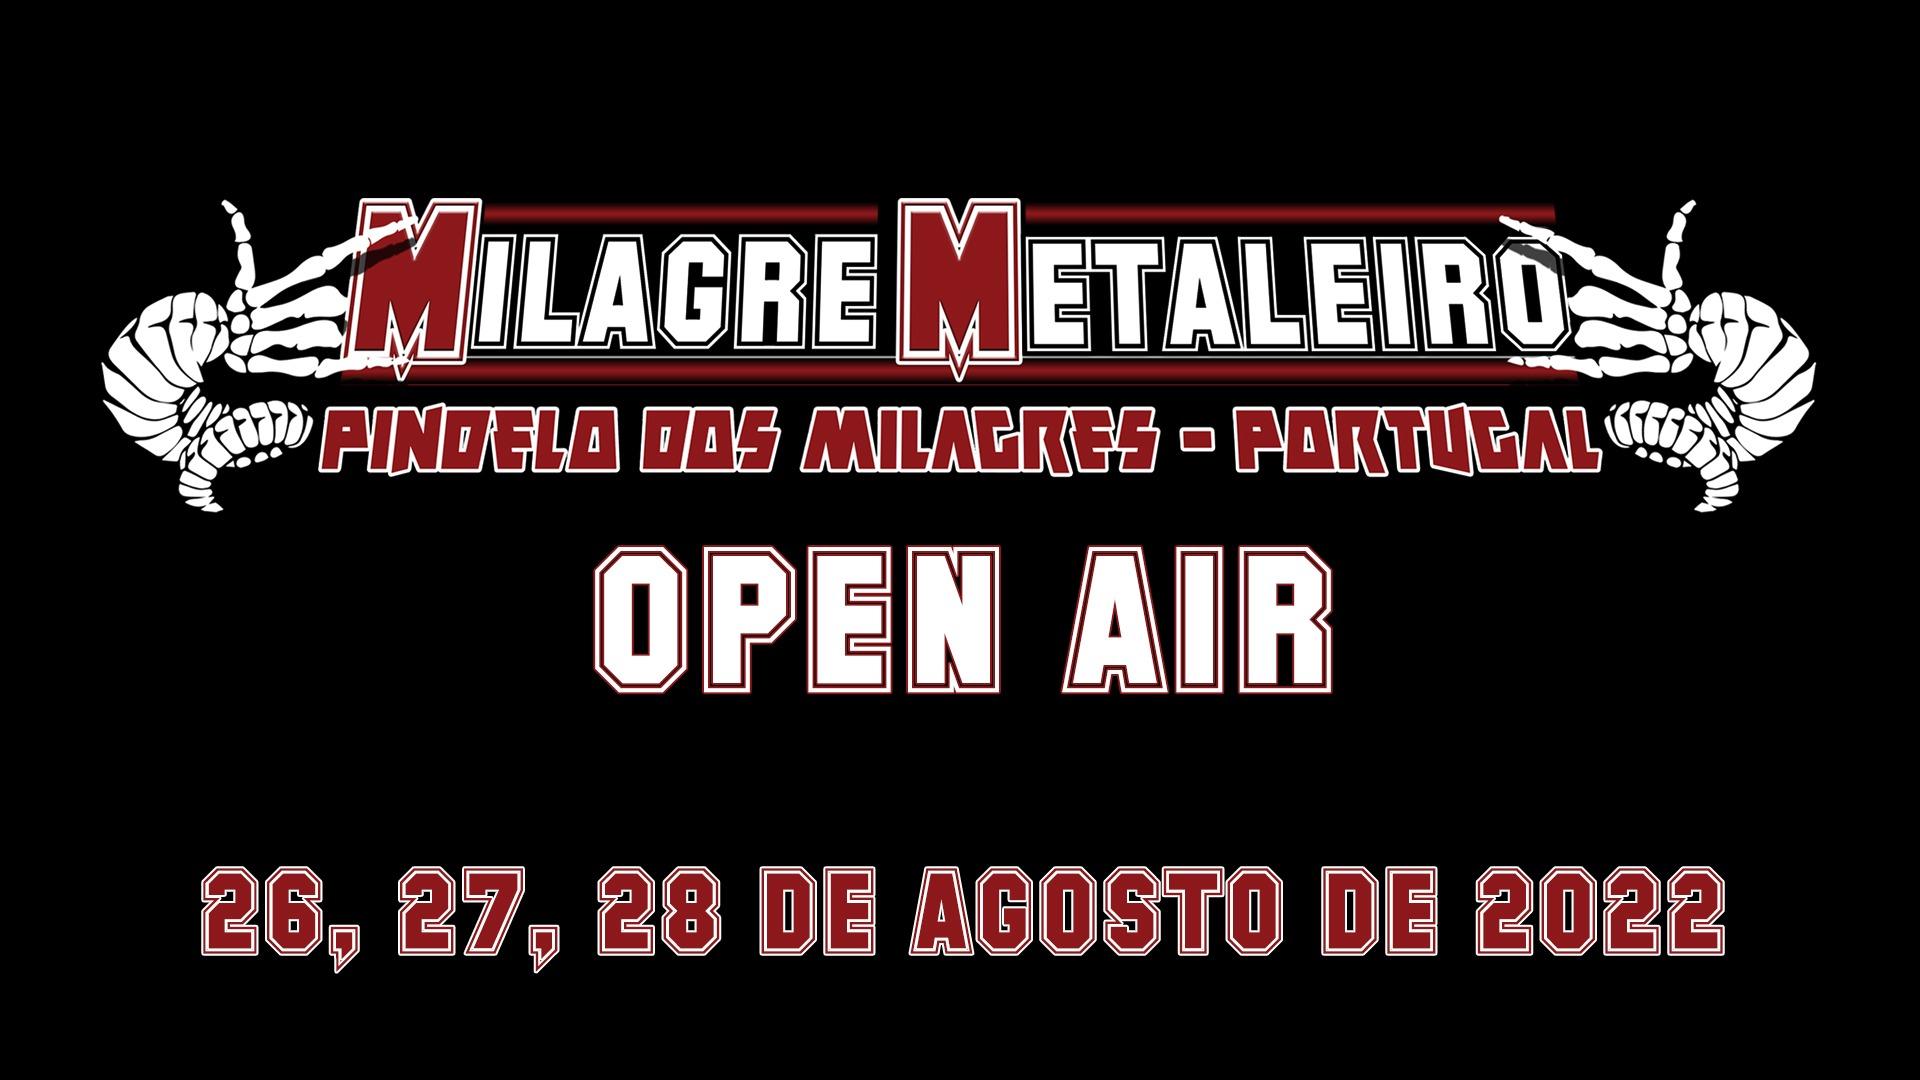 Milagre Metaleiro Open Air XIII